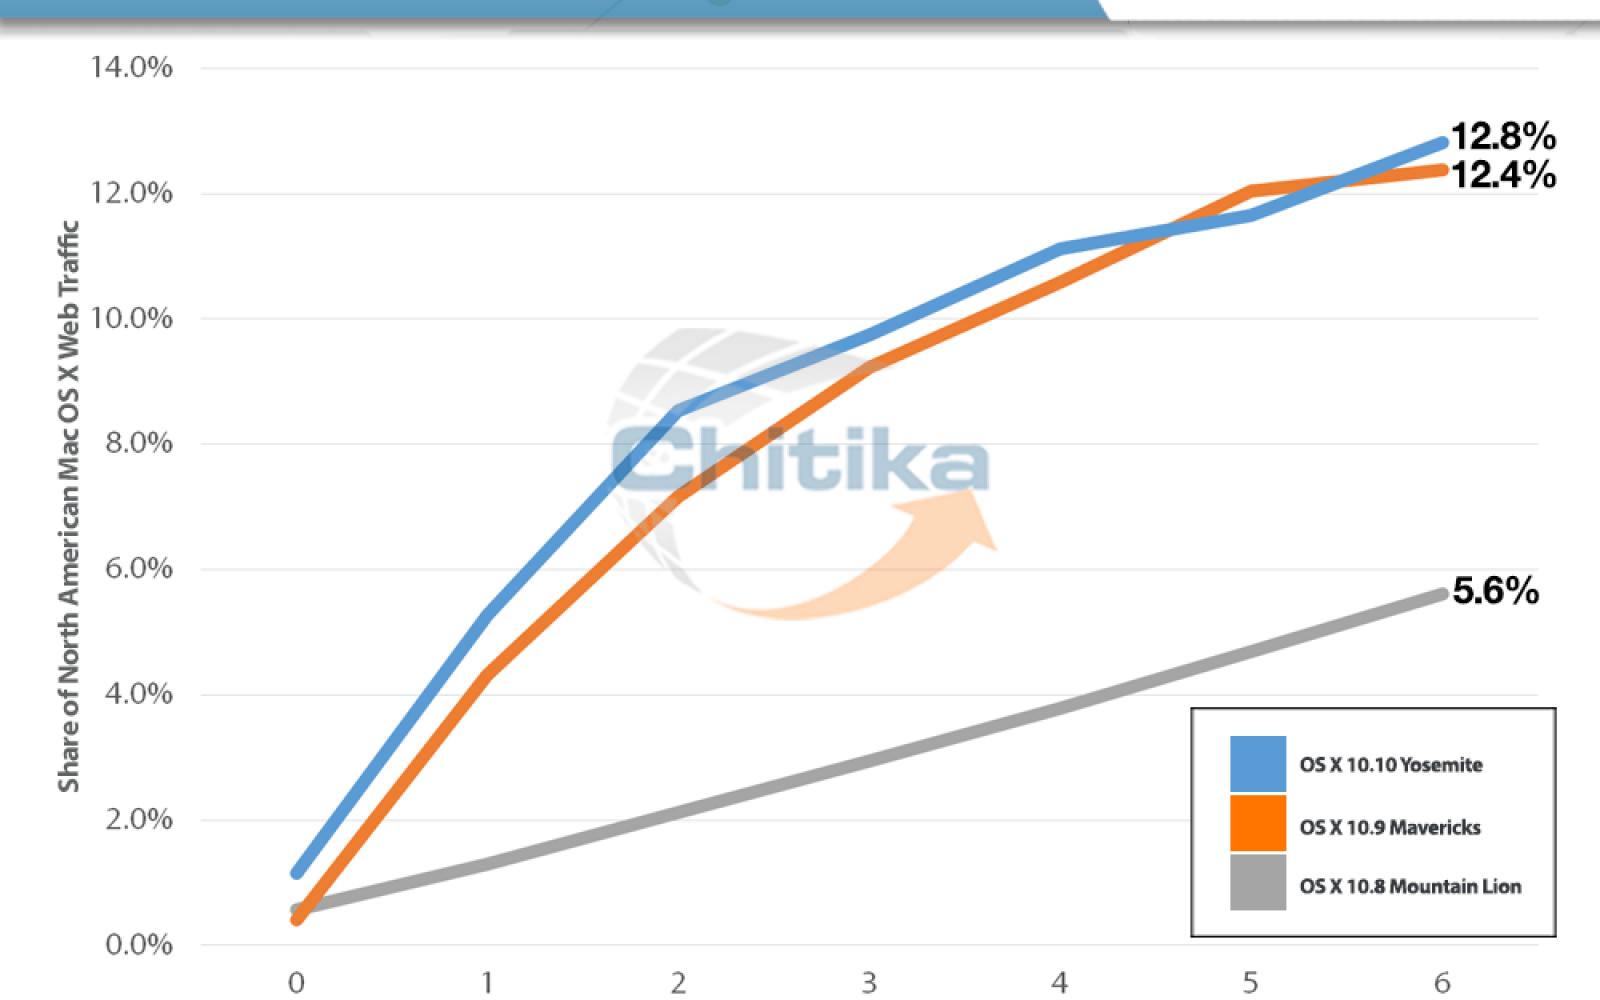 Chitika: OS X Yosemite adoption rate slightly higher than Mavericks in first week